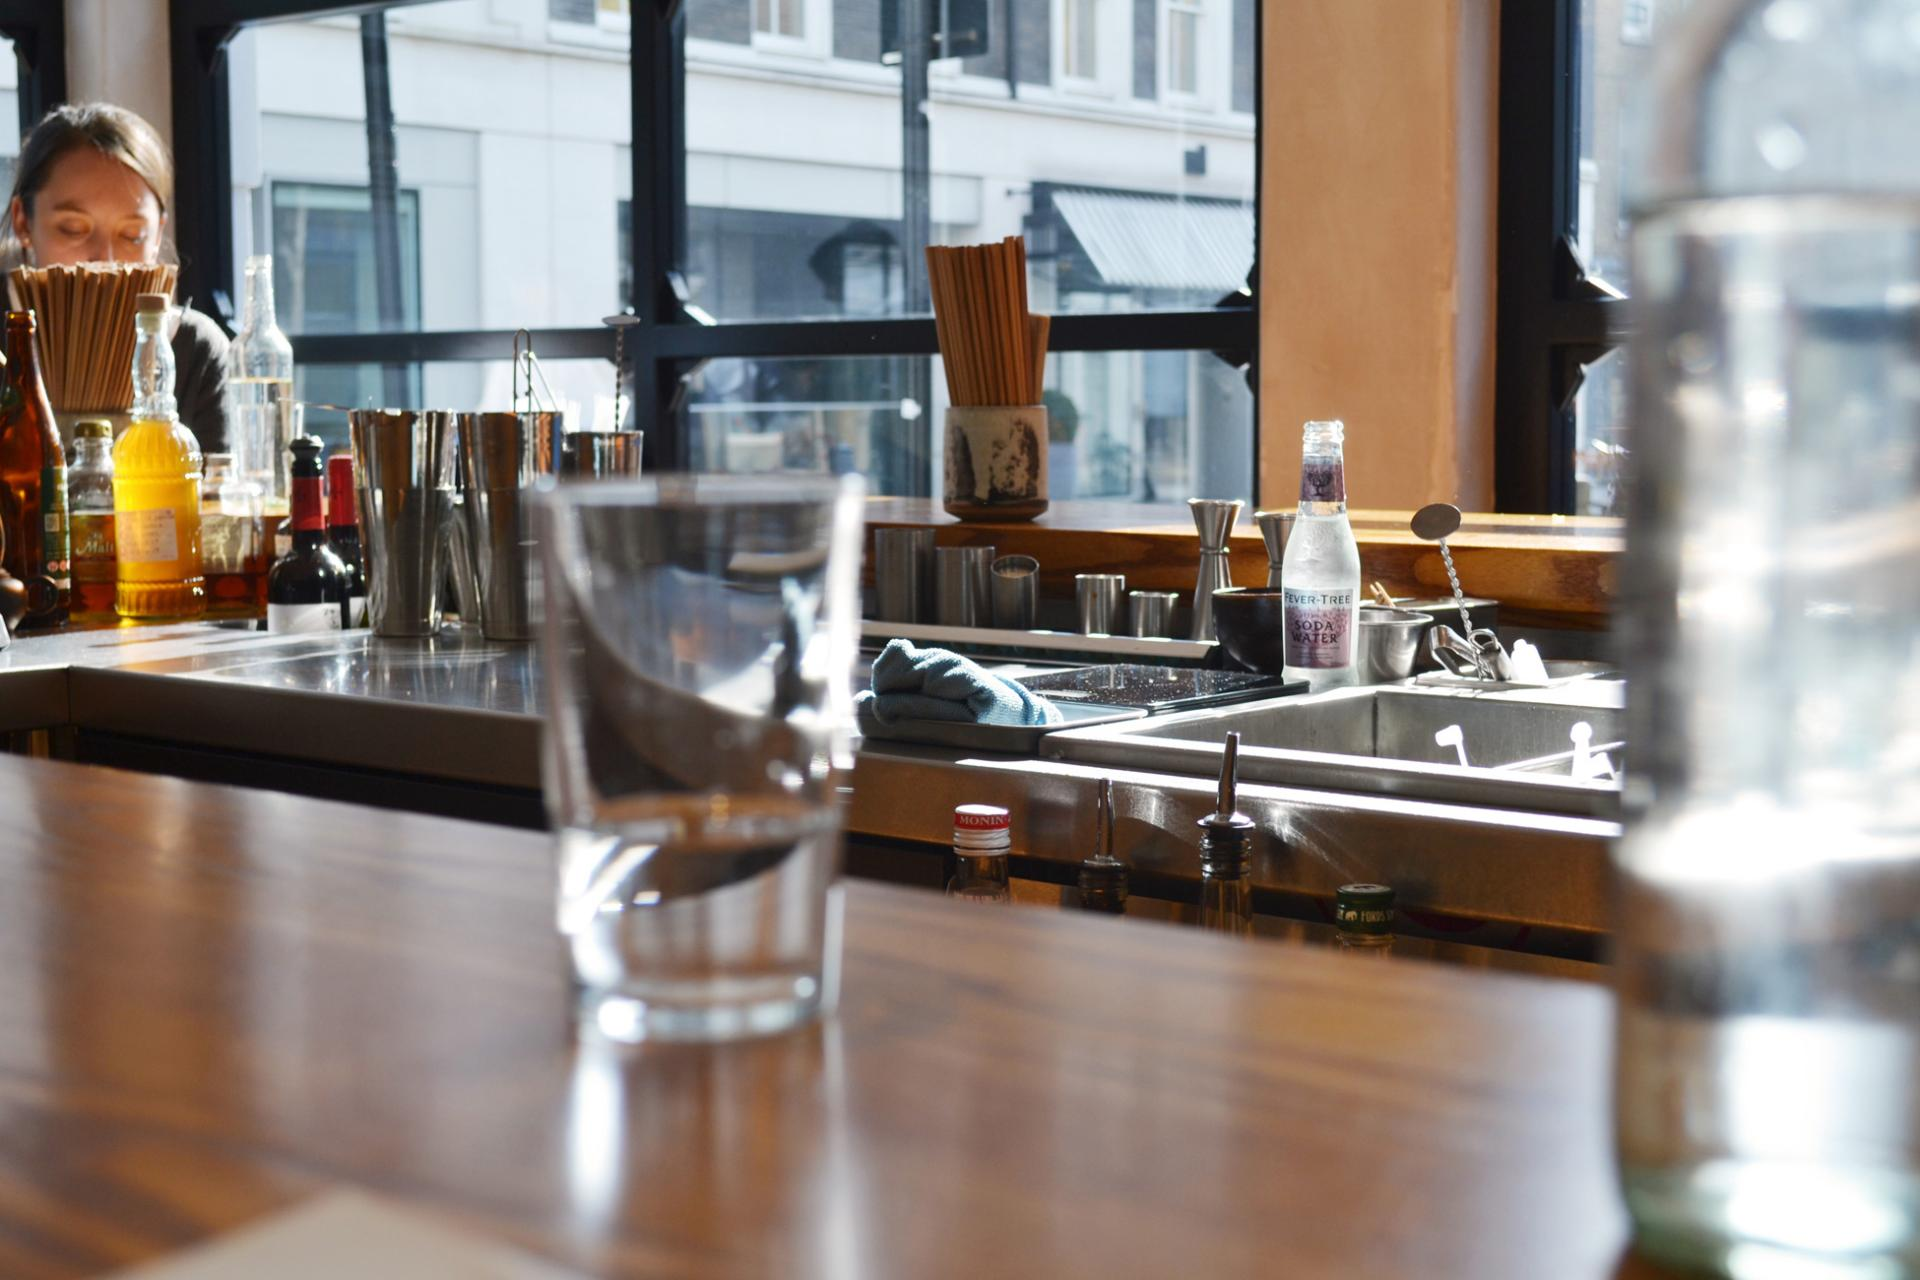 bao-london-restaurante-170511120559002-Kopie